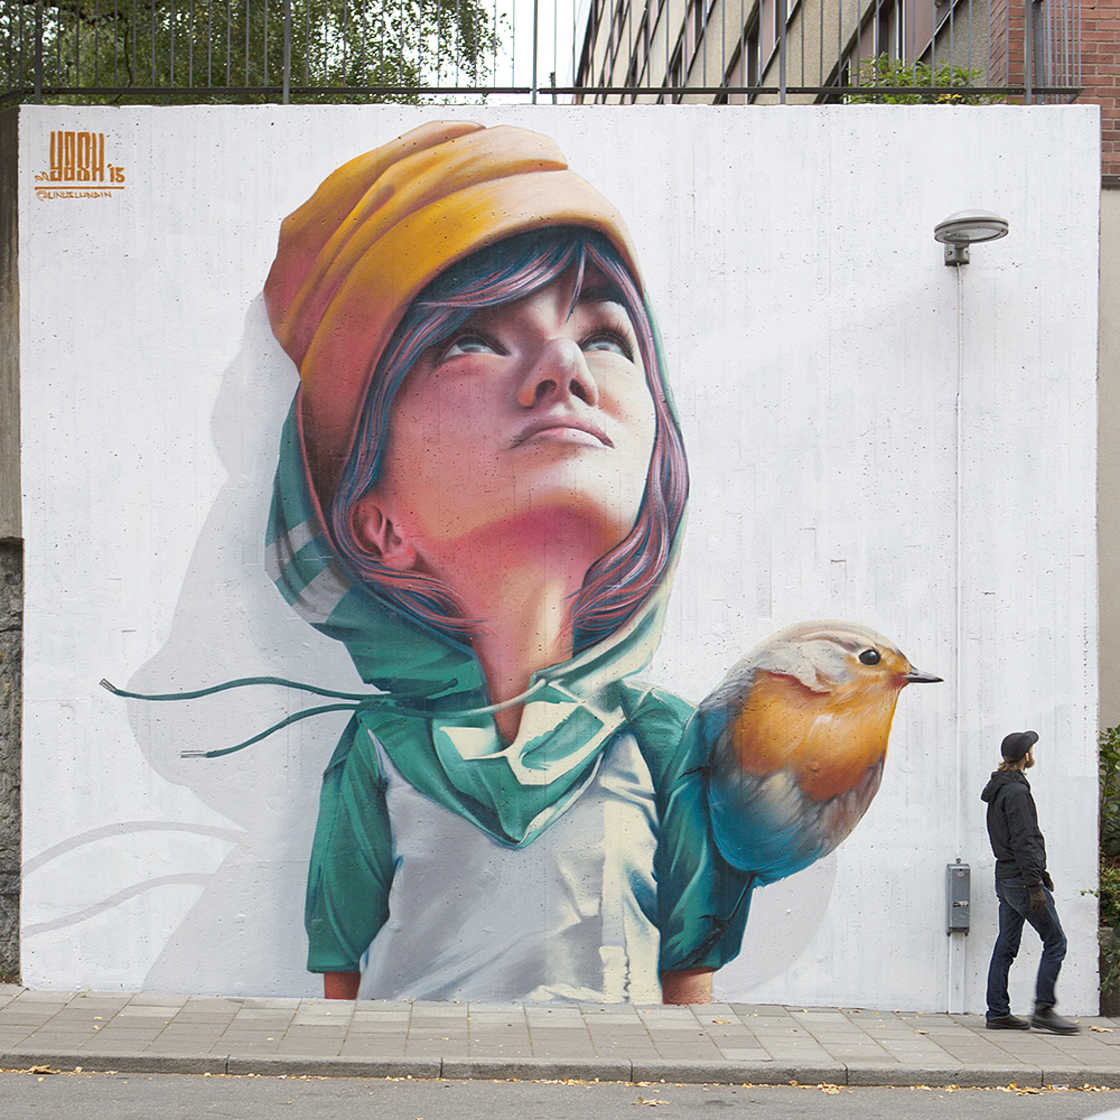 yash-one-street-art-8.jpg